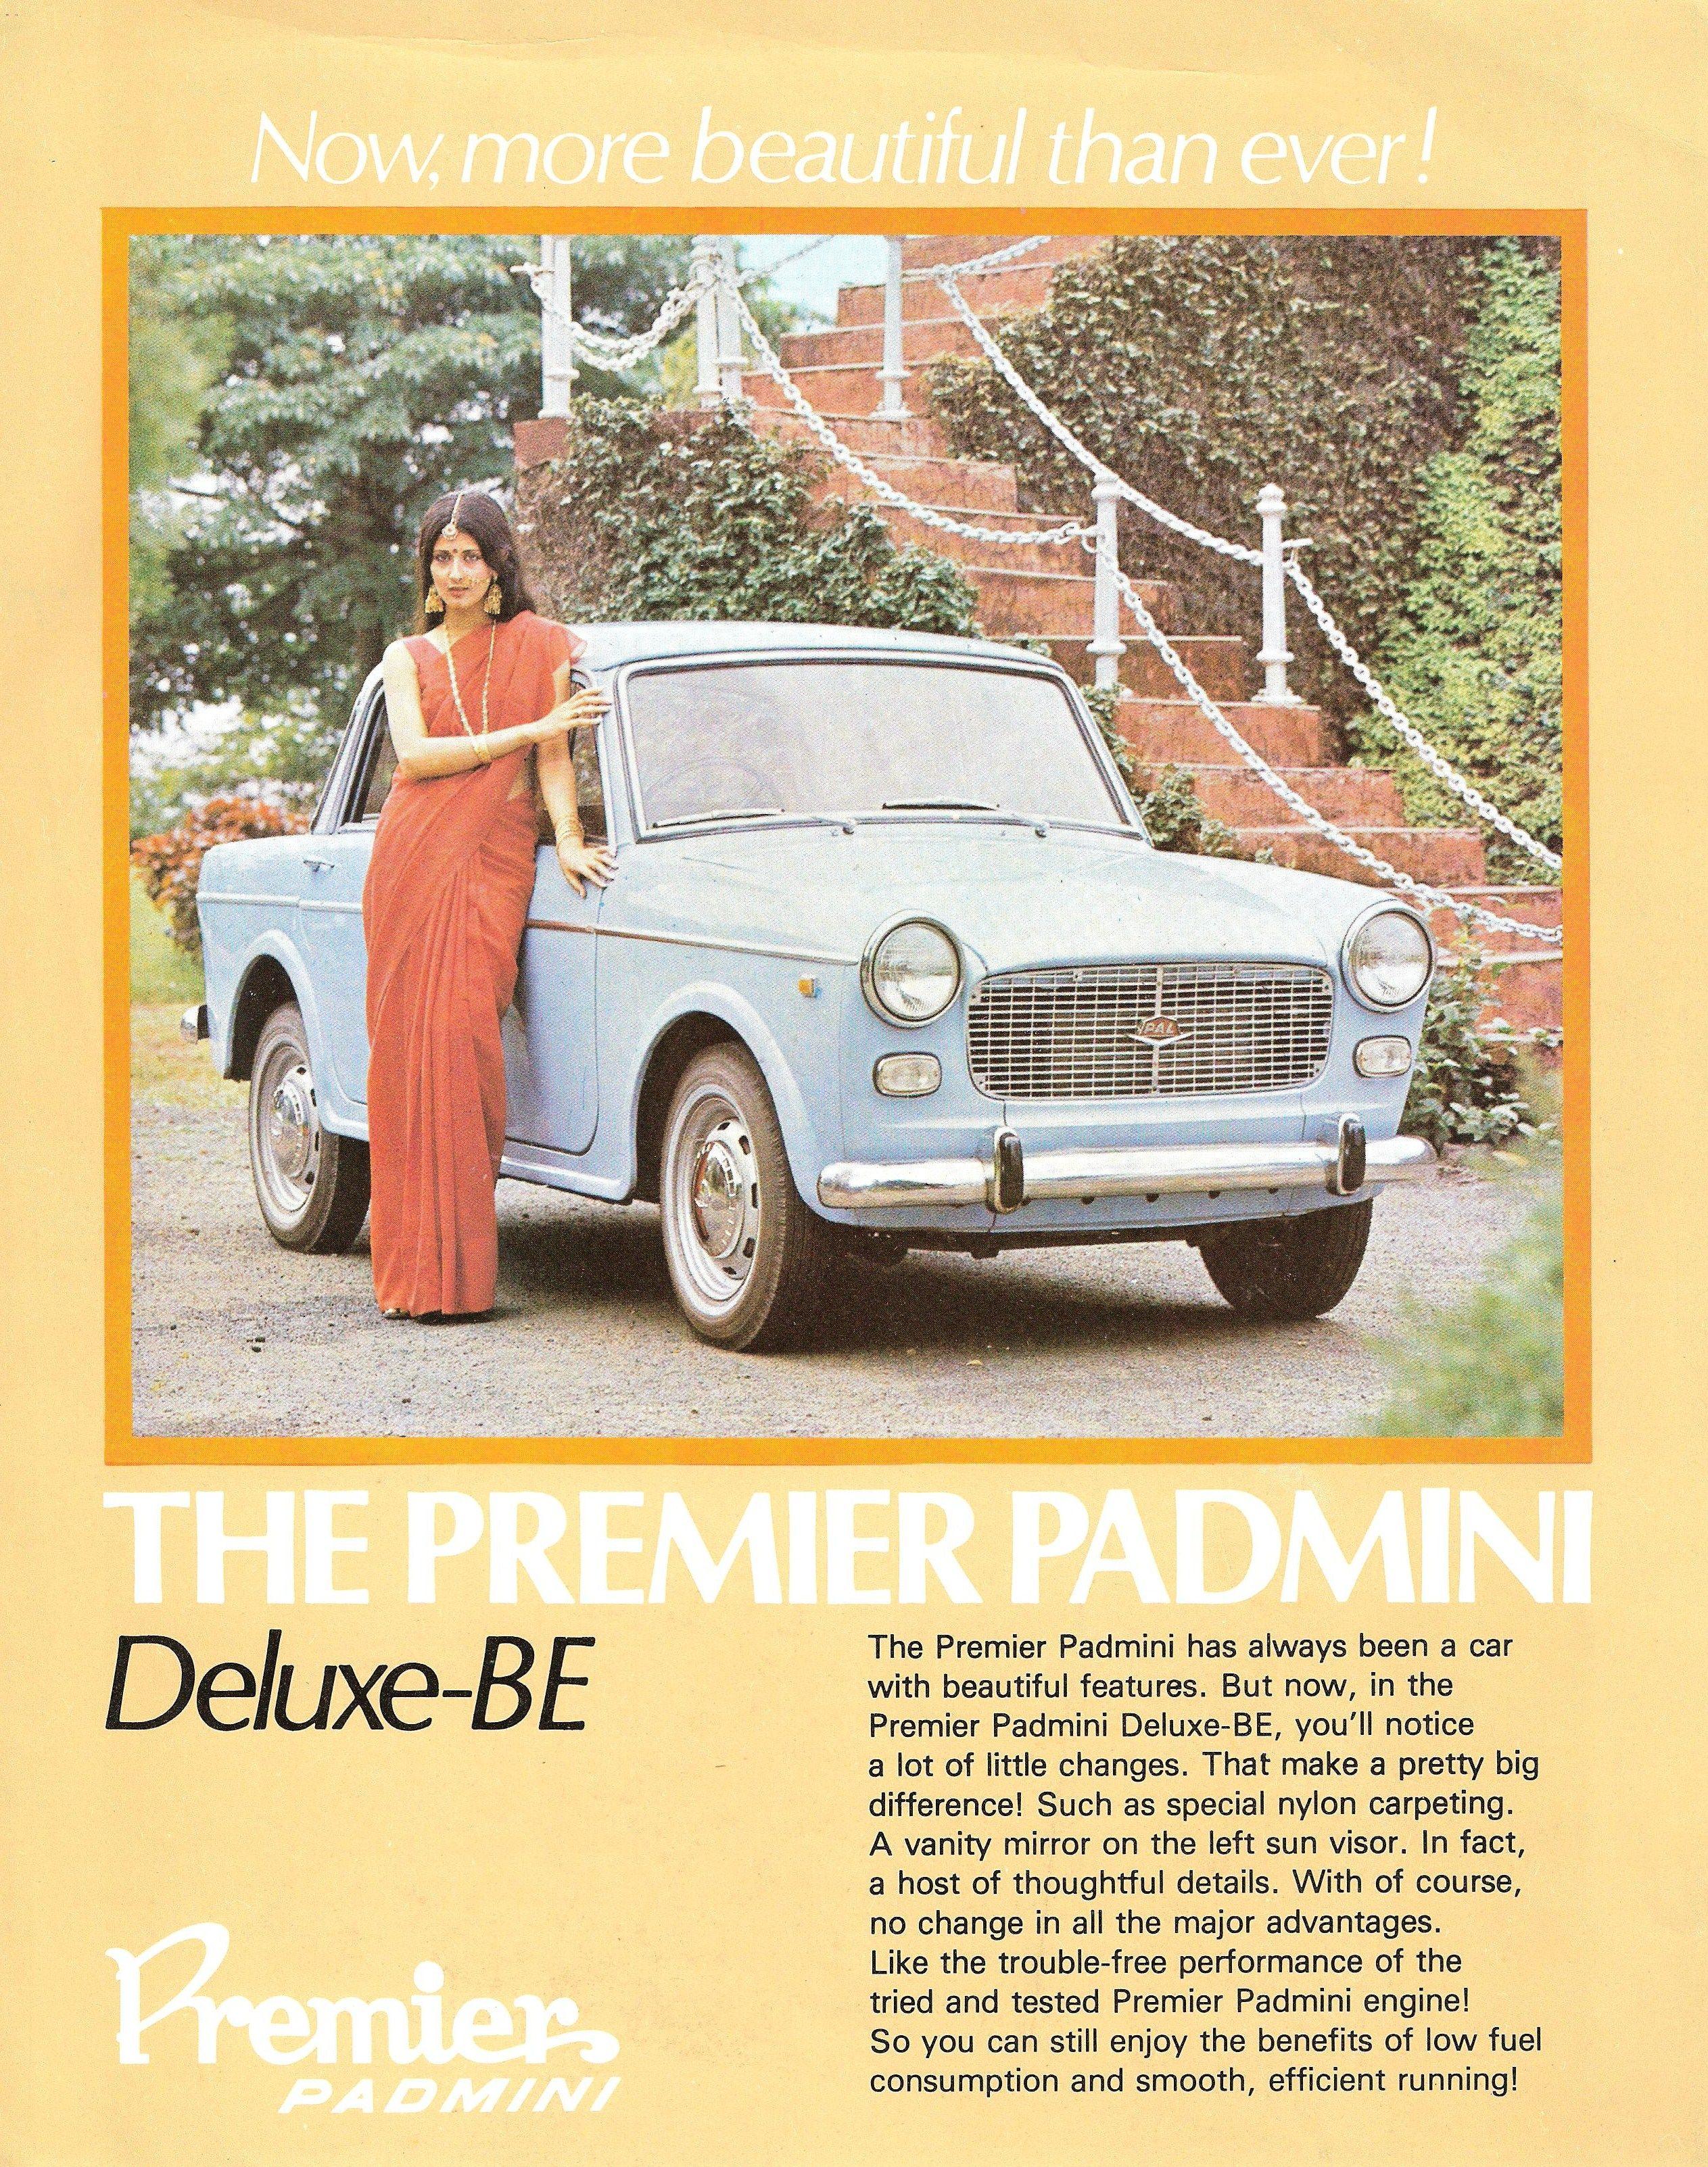 1995 Premier Padmini S1 Deluxe Bu Fiat Fiat Cars Mini Cars